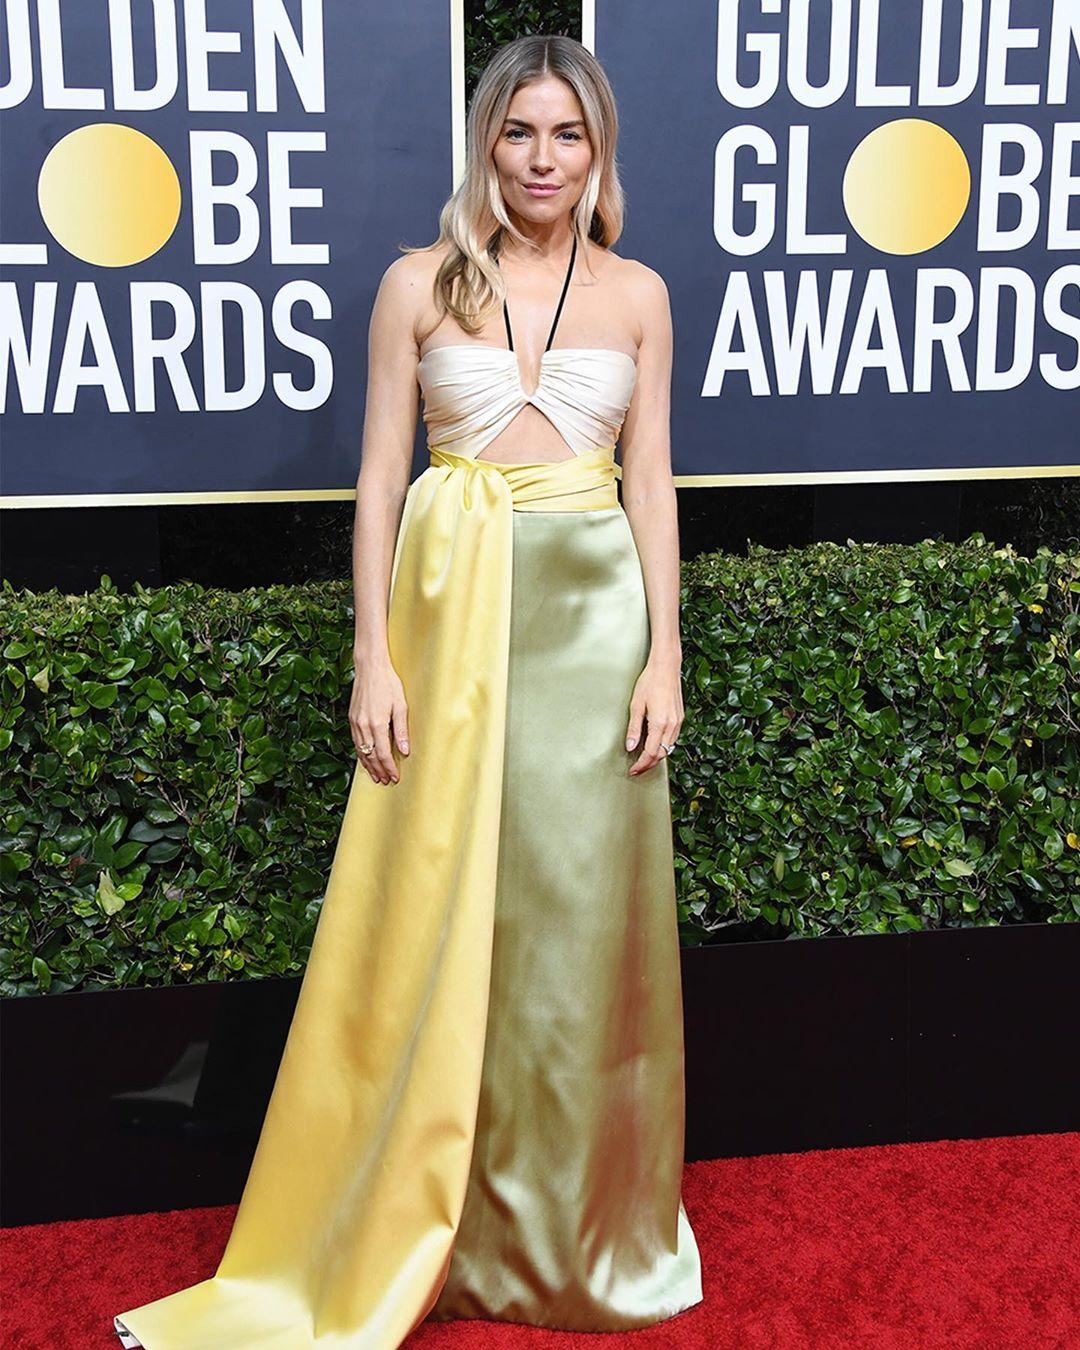 Sienna Miller at the Golden Globe Red Carpet